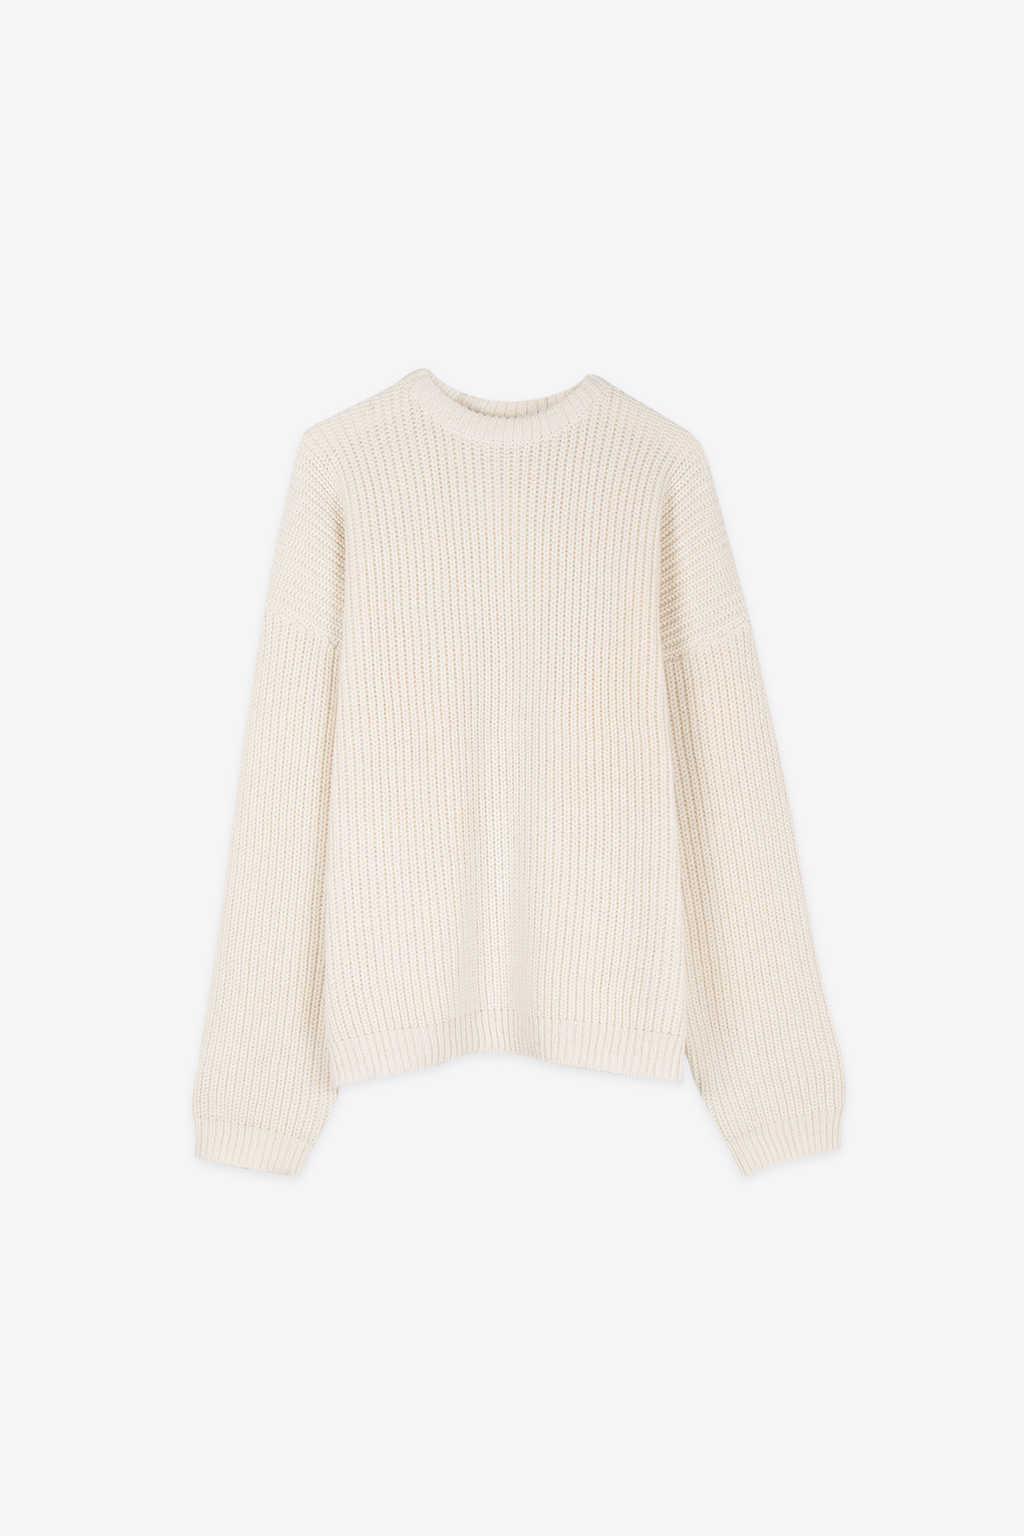 Sweater 1002 Cream 5